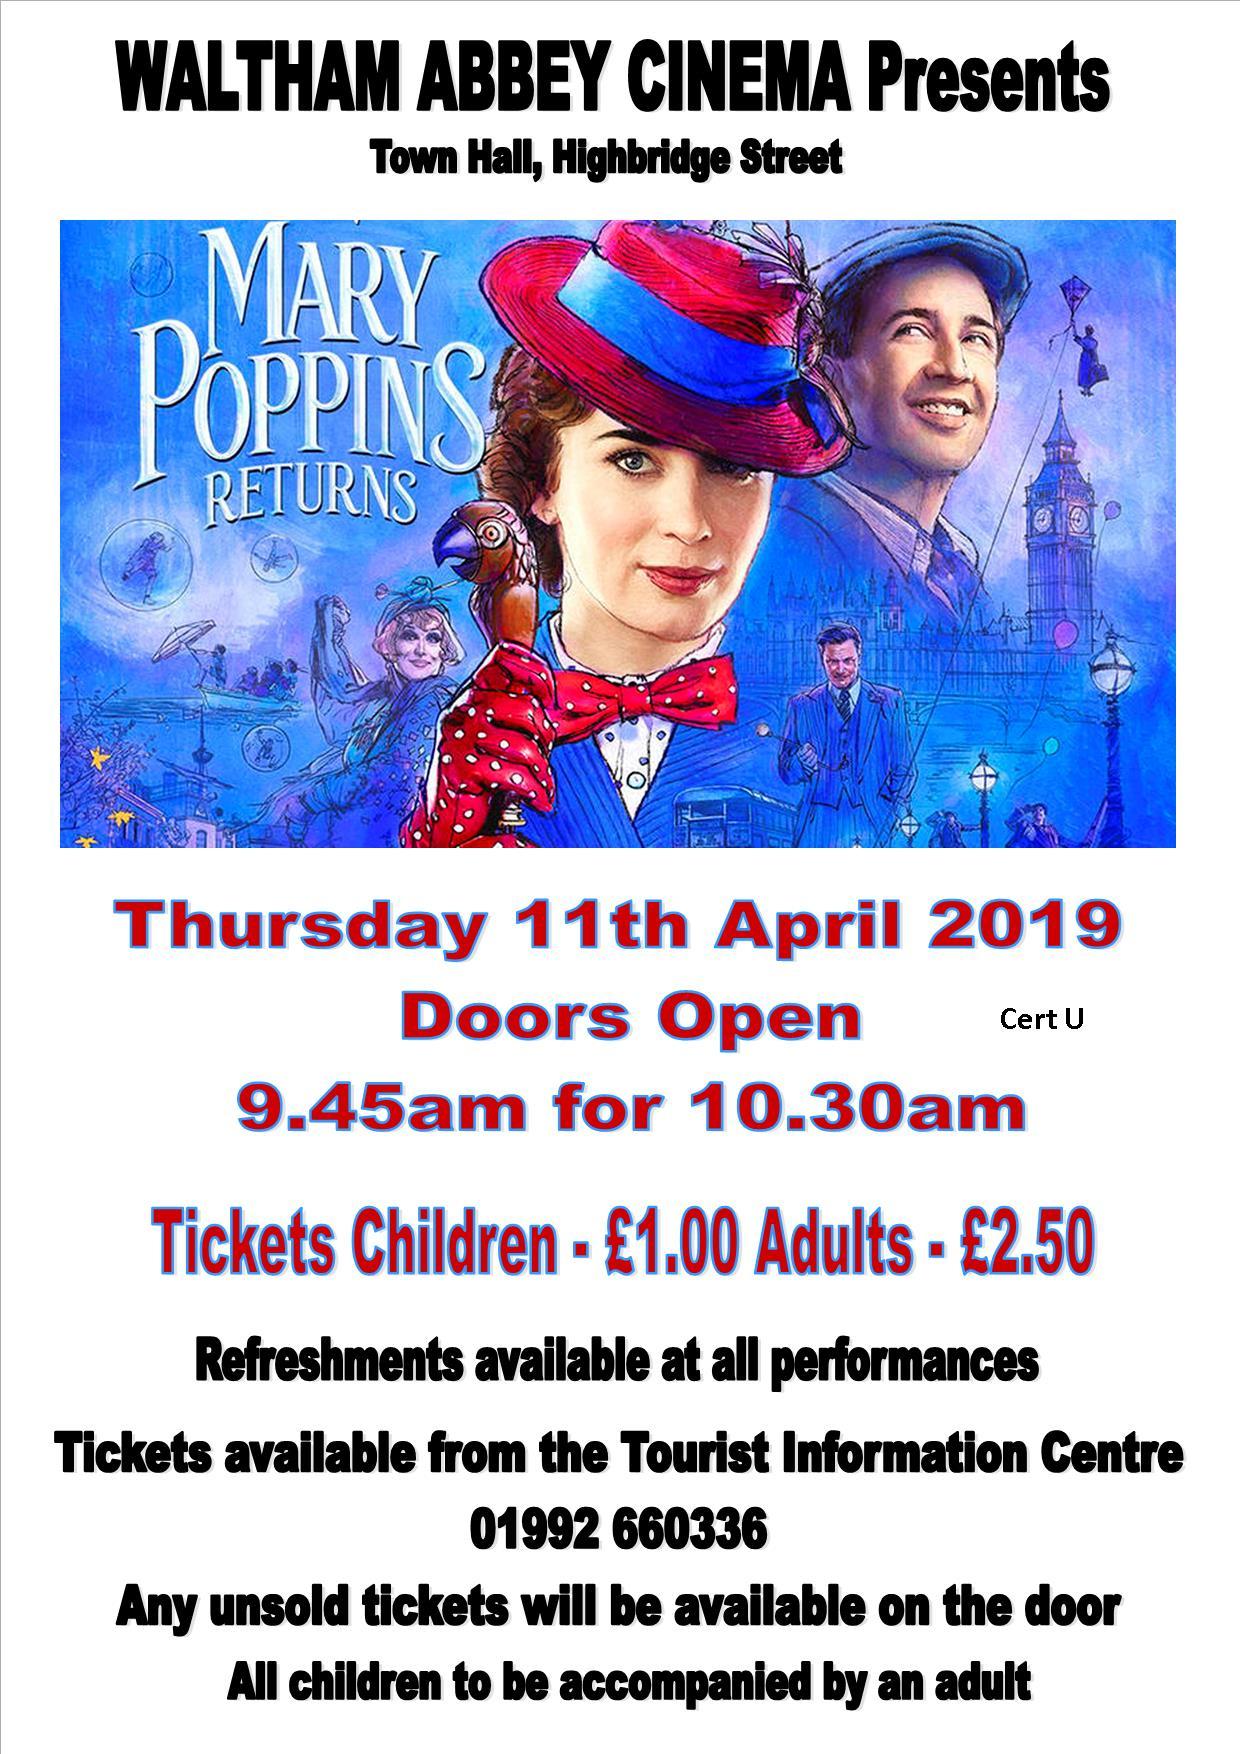 Waltham Abbey Cinema Presents - Mary Poppins Returns - Cert U